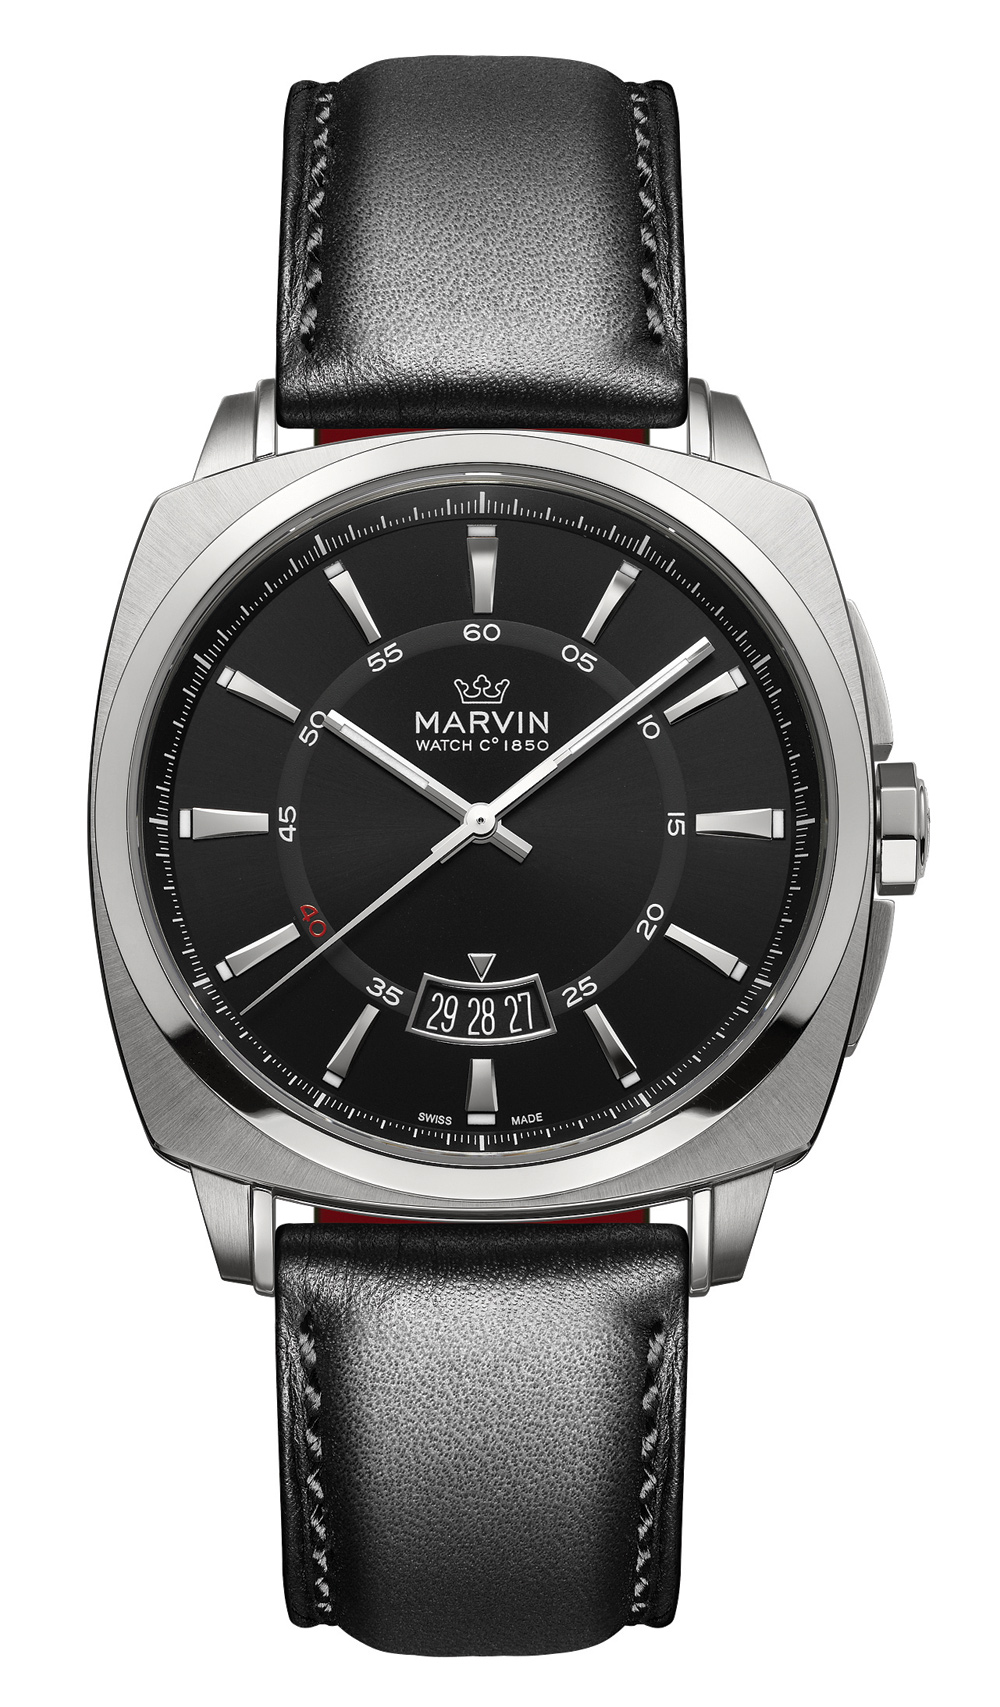 Marvin - Malton 160 Cushion